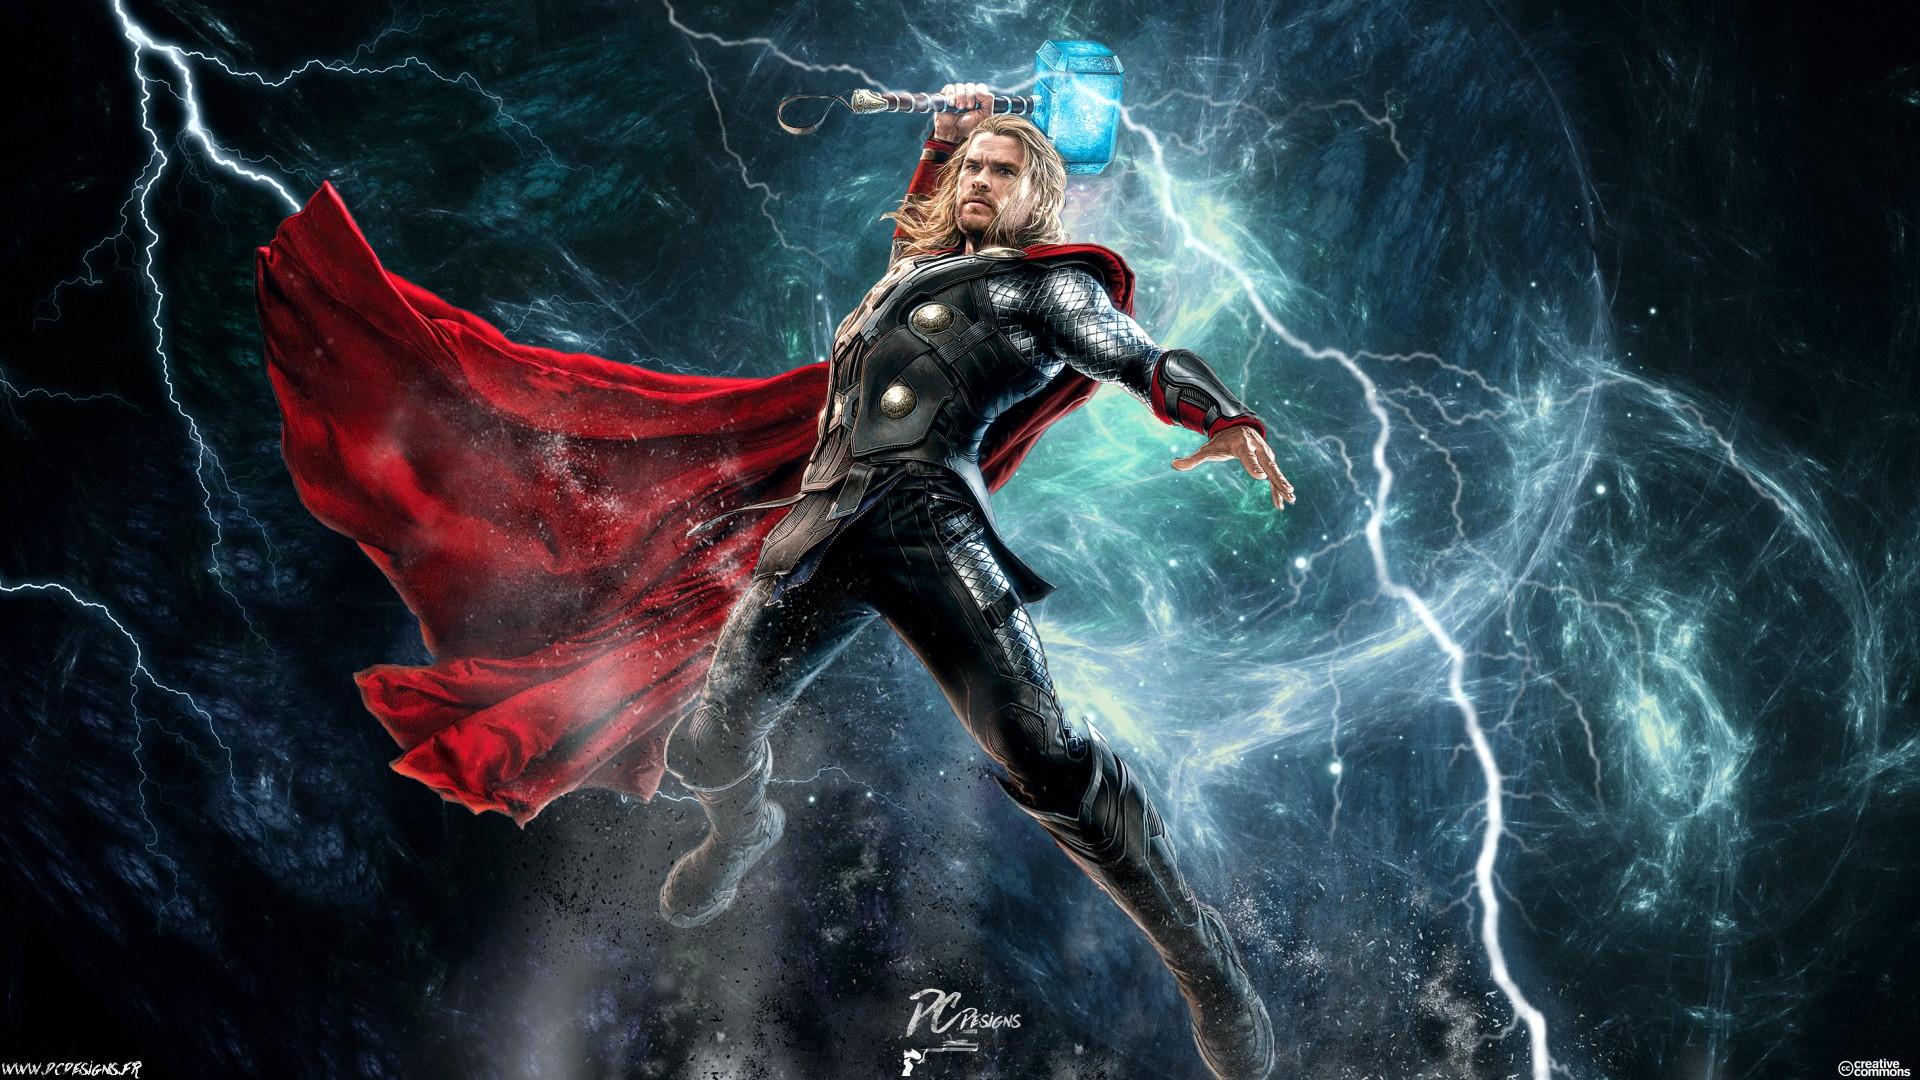 Movie – Avengers: Age of Ultron Thor Chris Hemsworth Avengers Fan Art  Digital Art Wallpaper